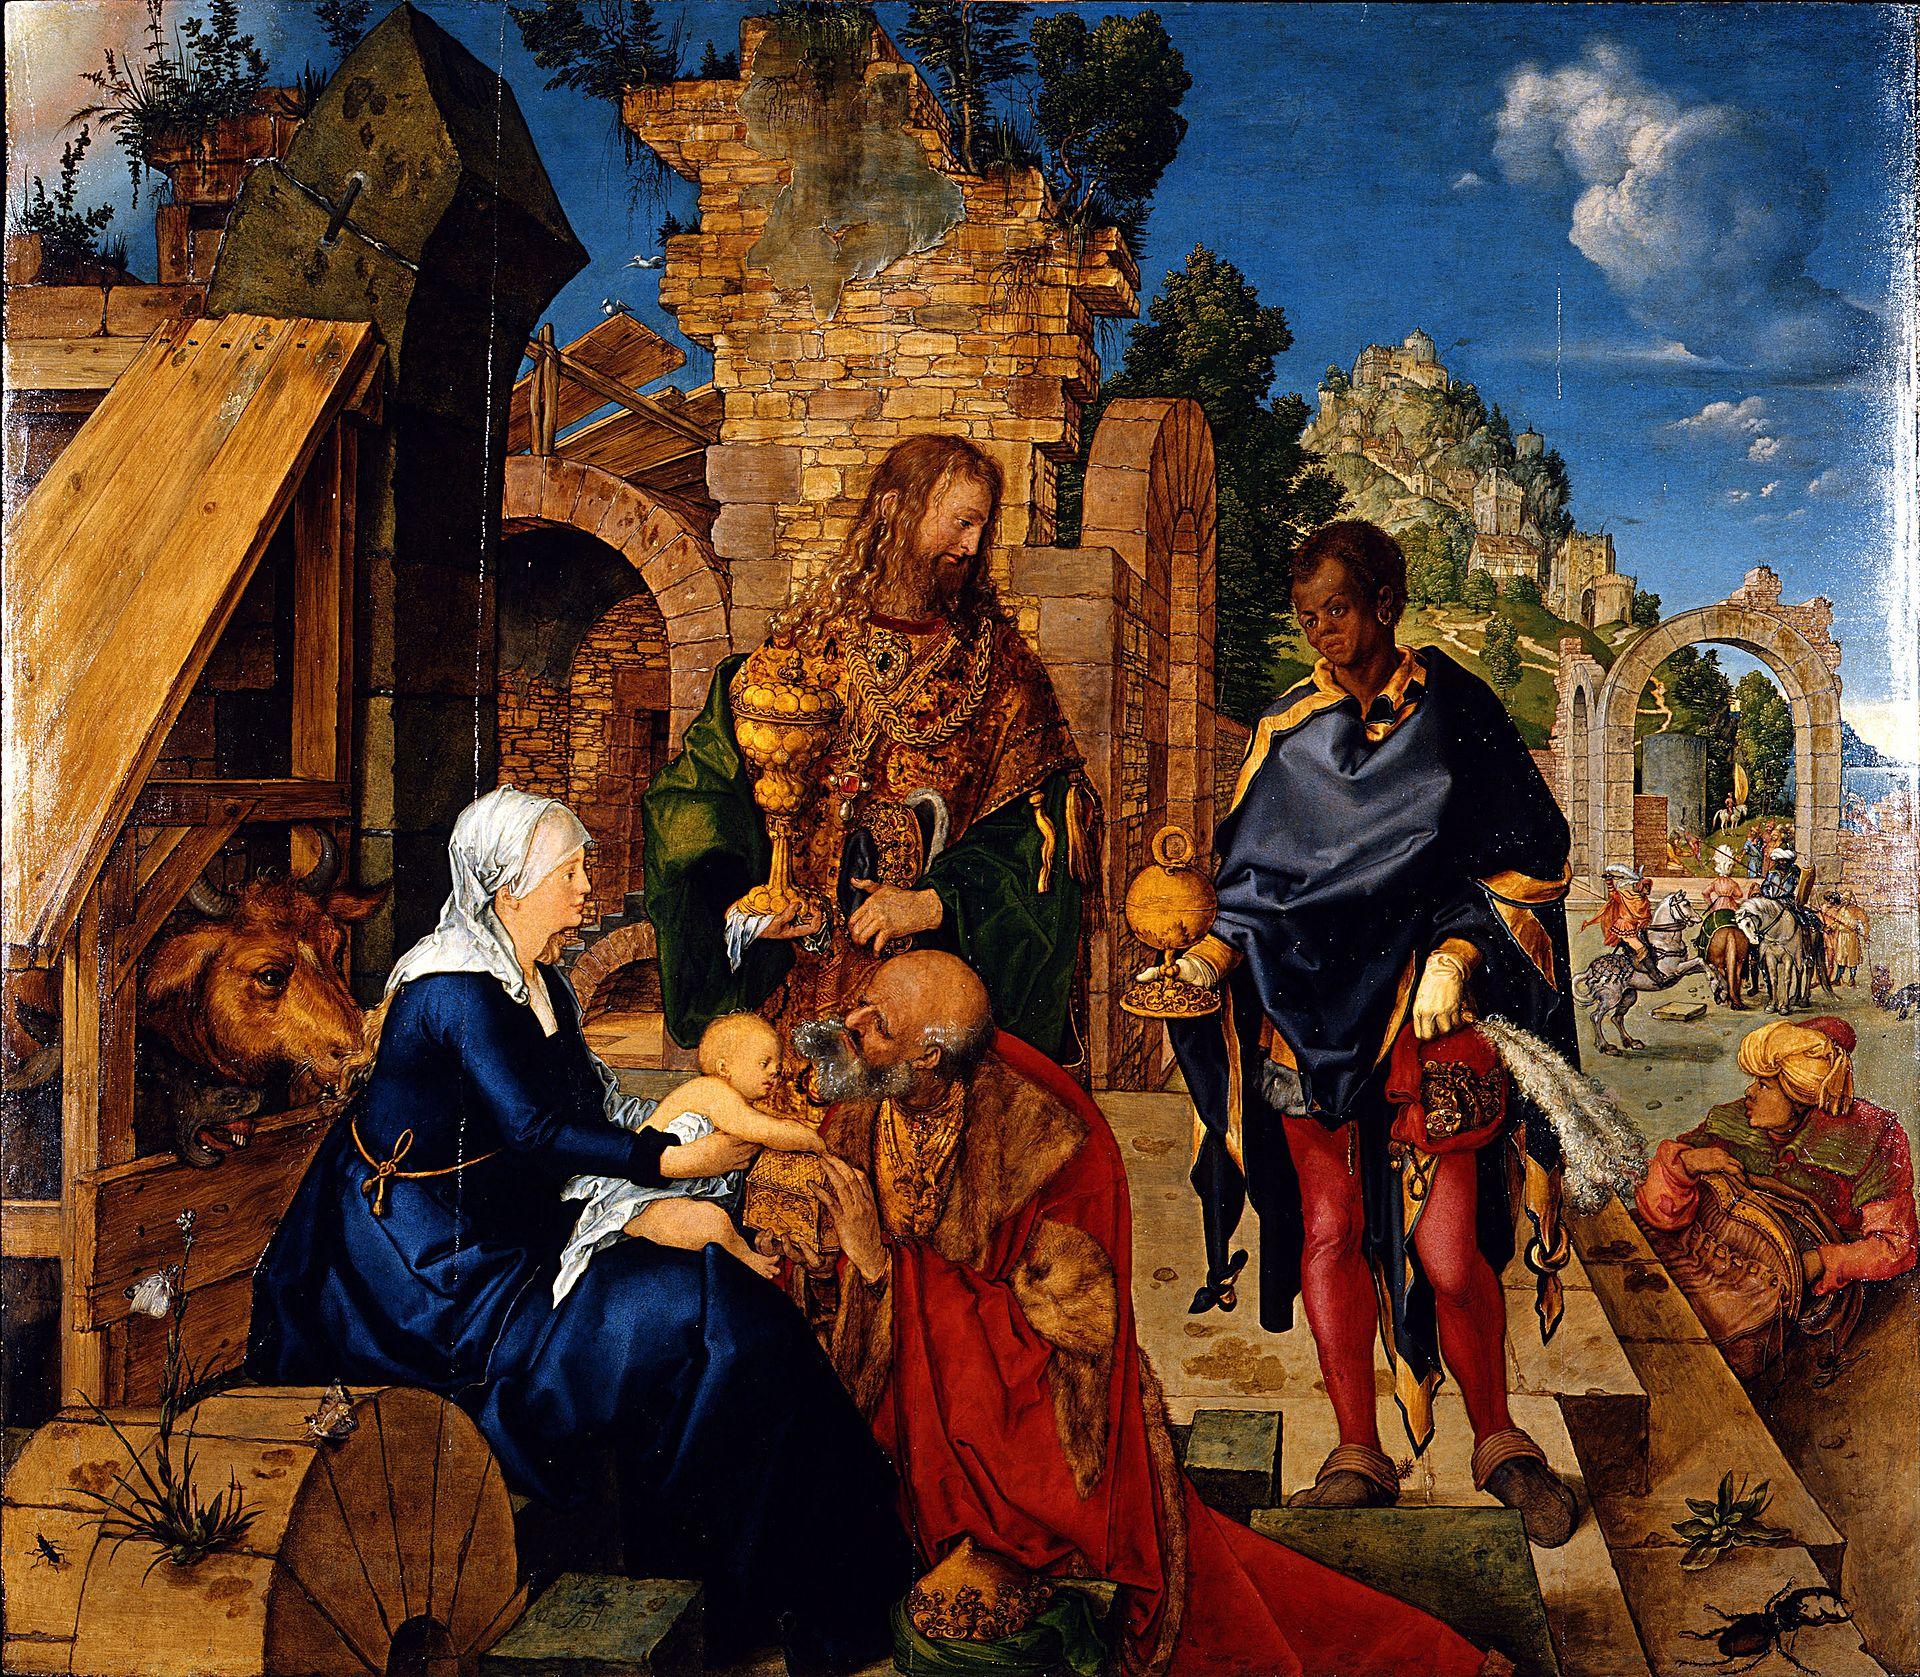 Adoration rois mages visite Jésus NativitéAlbrecht Dürer